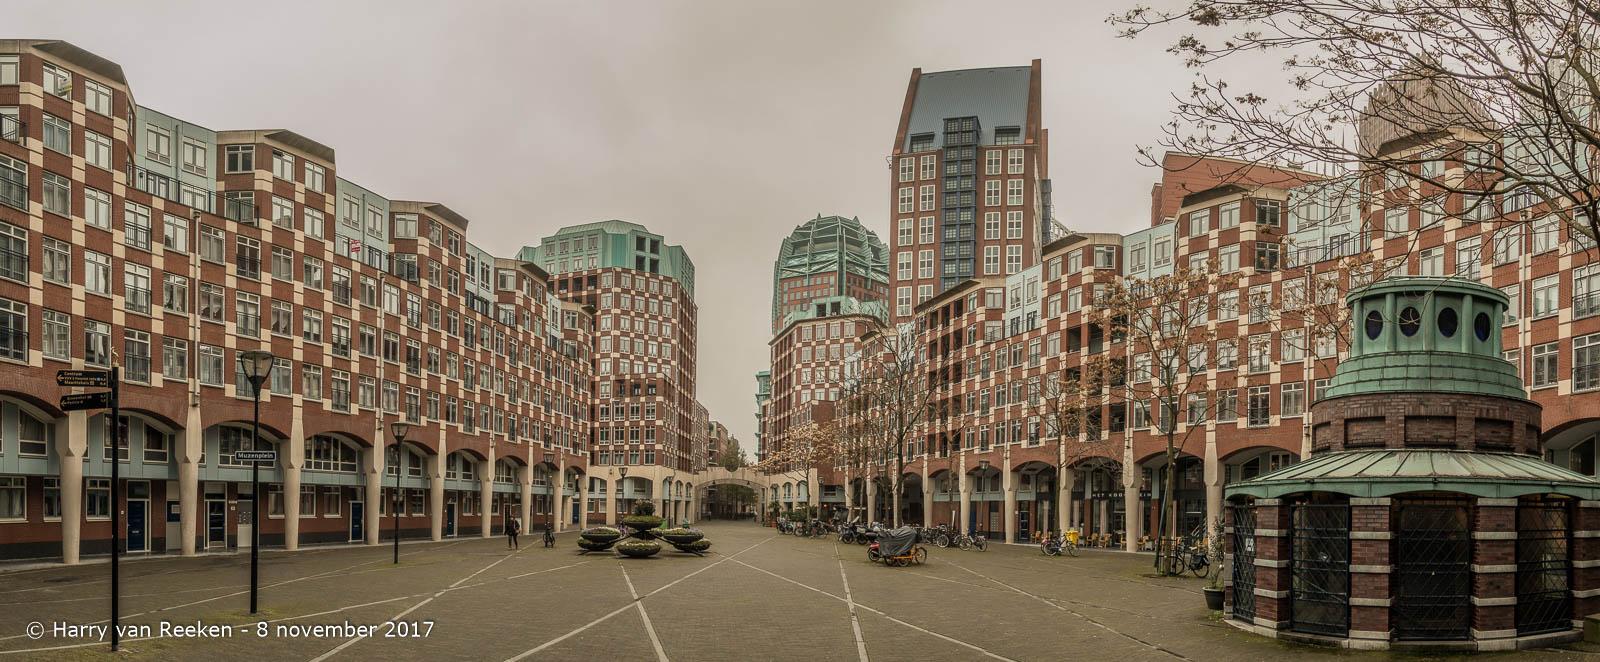 Muzenplein - Centrum pano (1 van 1)